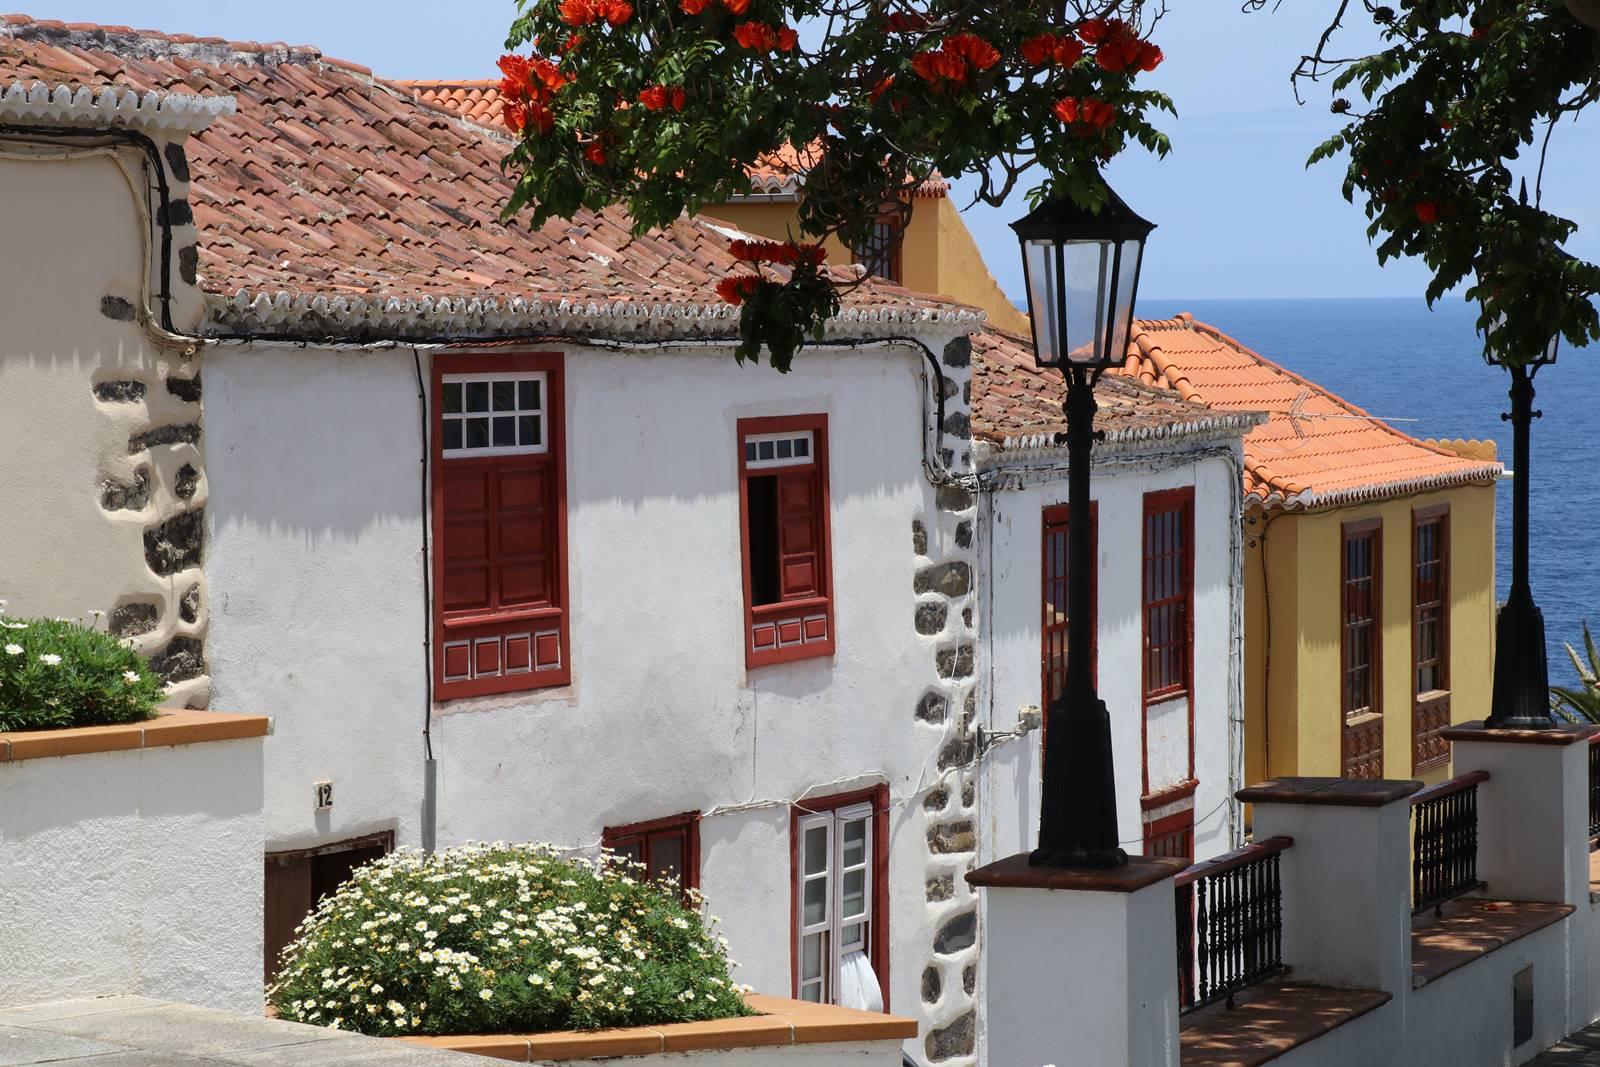 La Palma 29 San Andres (3)